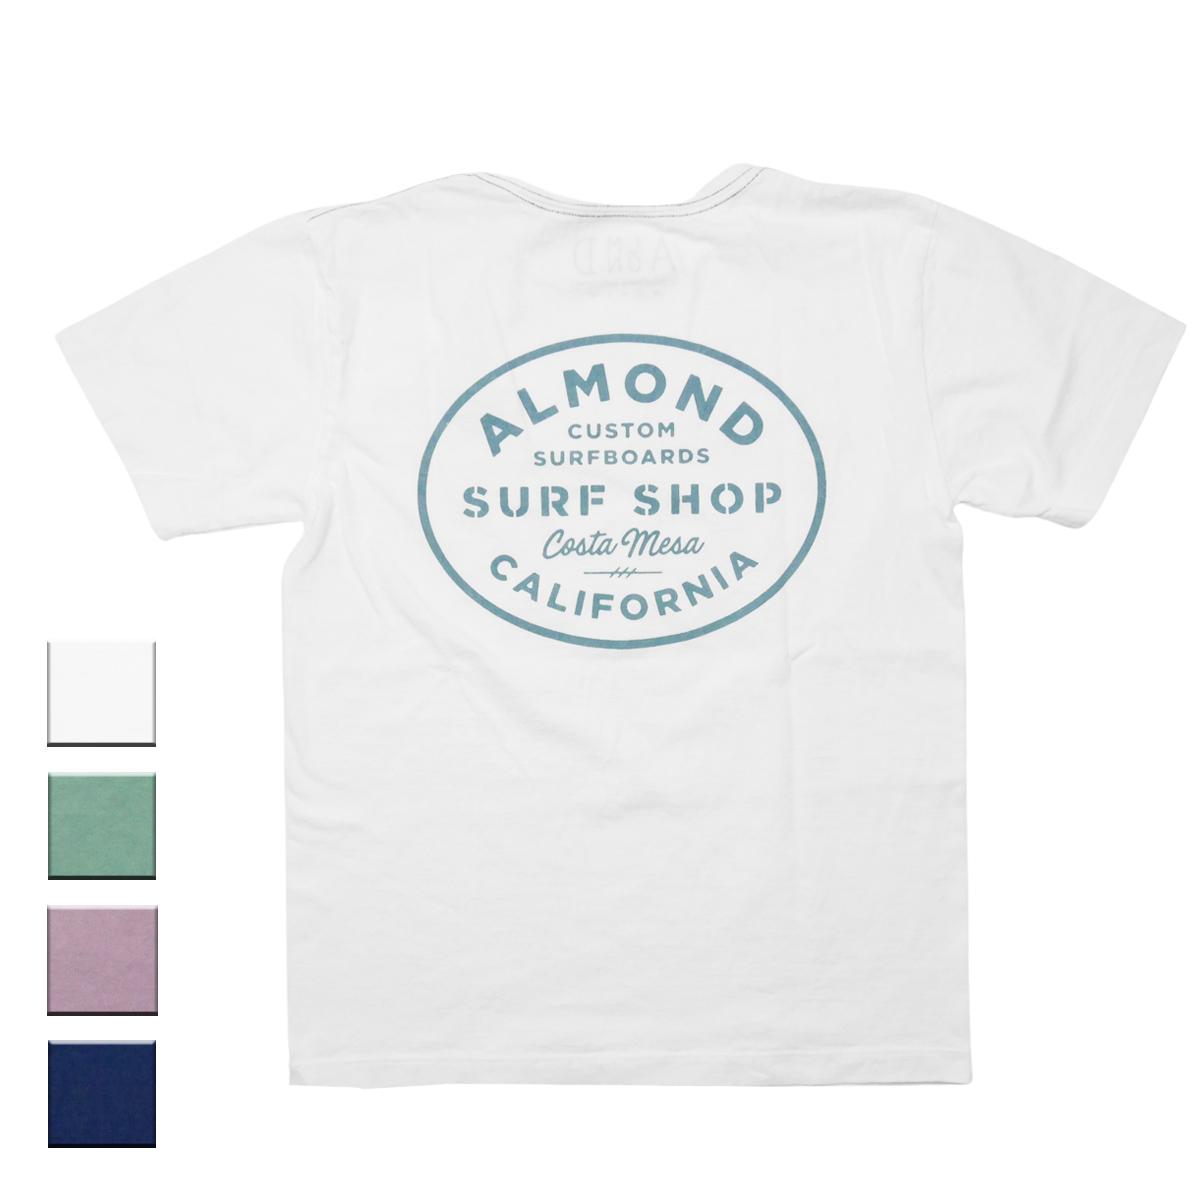 Almond Surf アーモンドサーフボードデザイン SURF SHOP S/S TEE